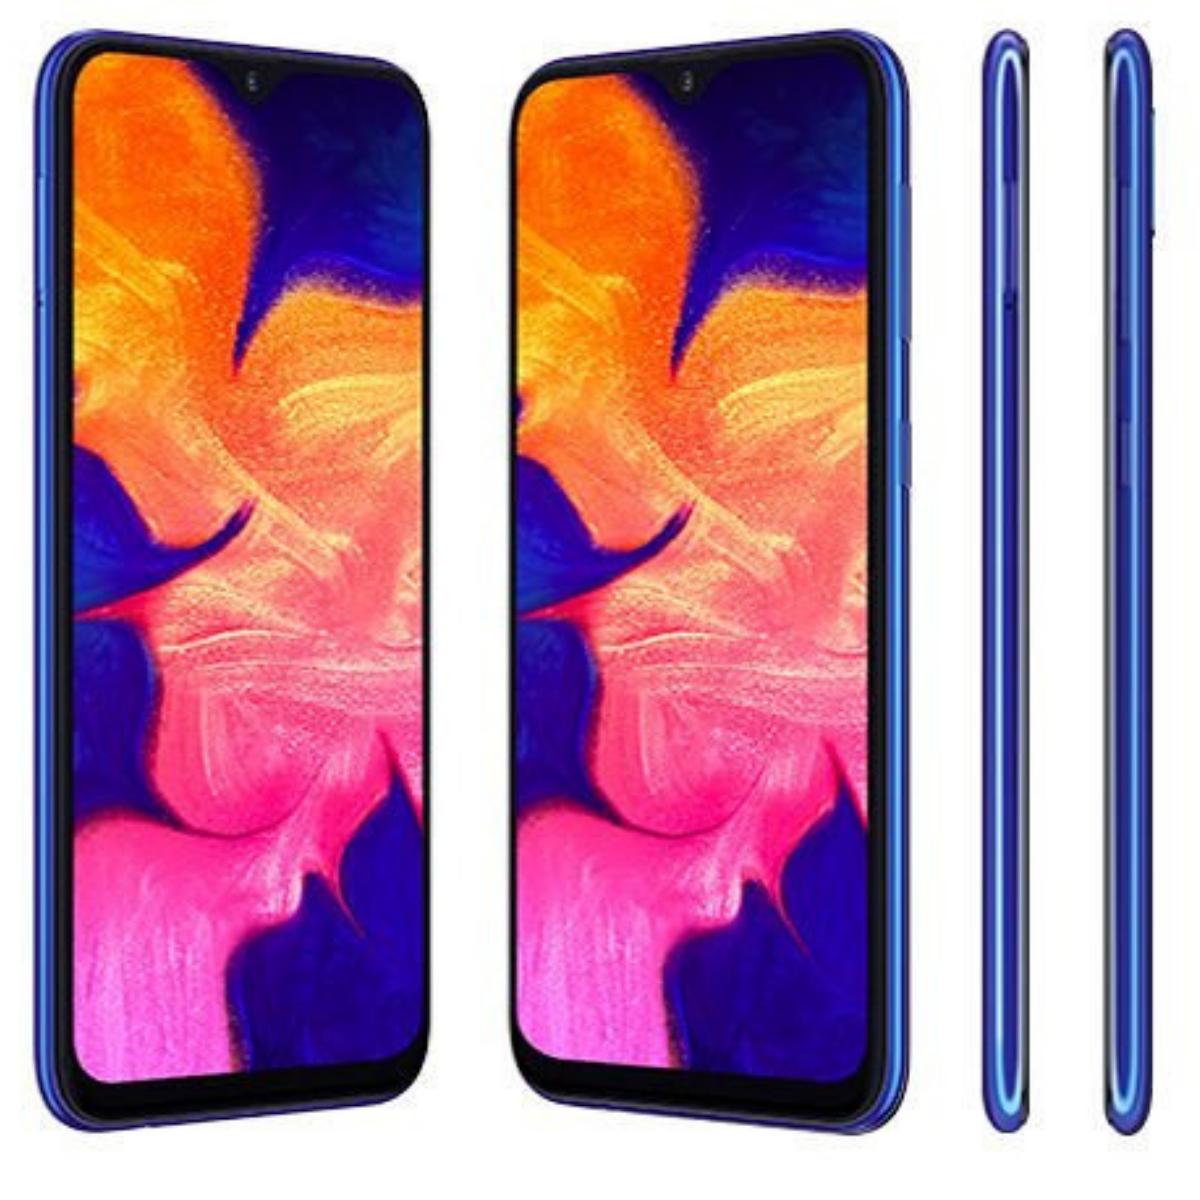 Samsung Galaxy A10e With Infinity V Display 3 000mah Battery Launched Samsung Galaxy Galaxy Samsung Gadgets